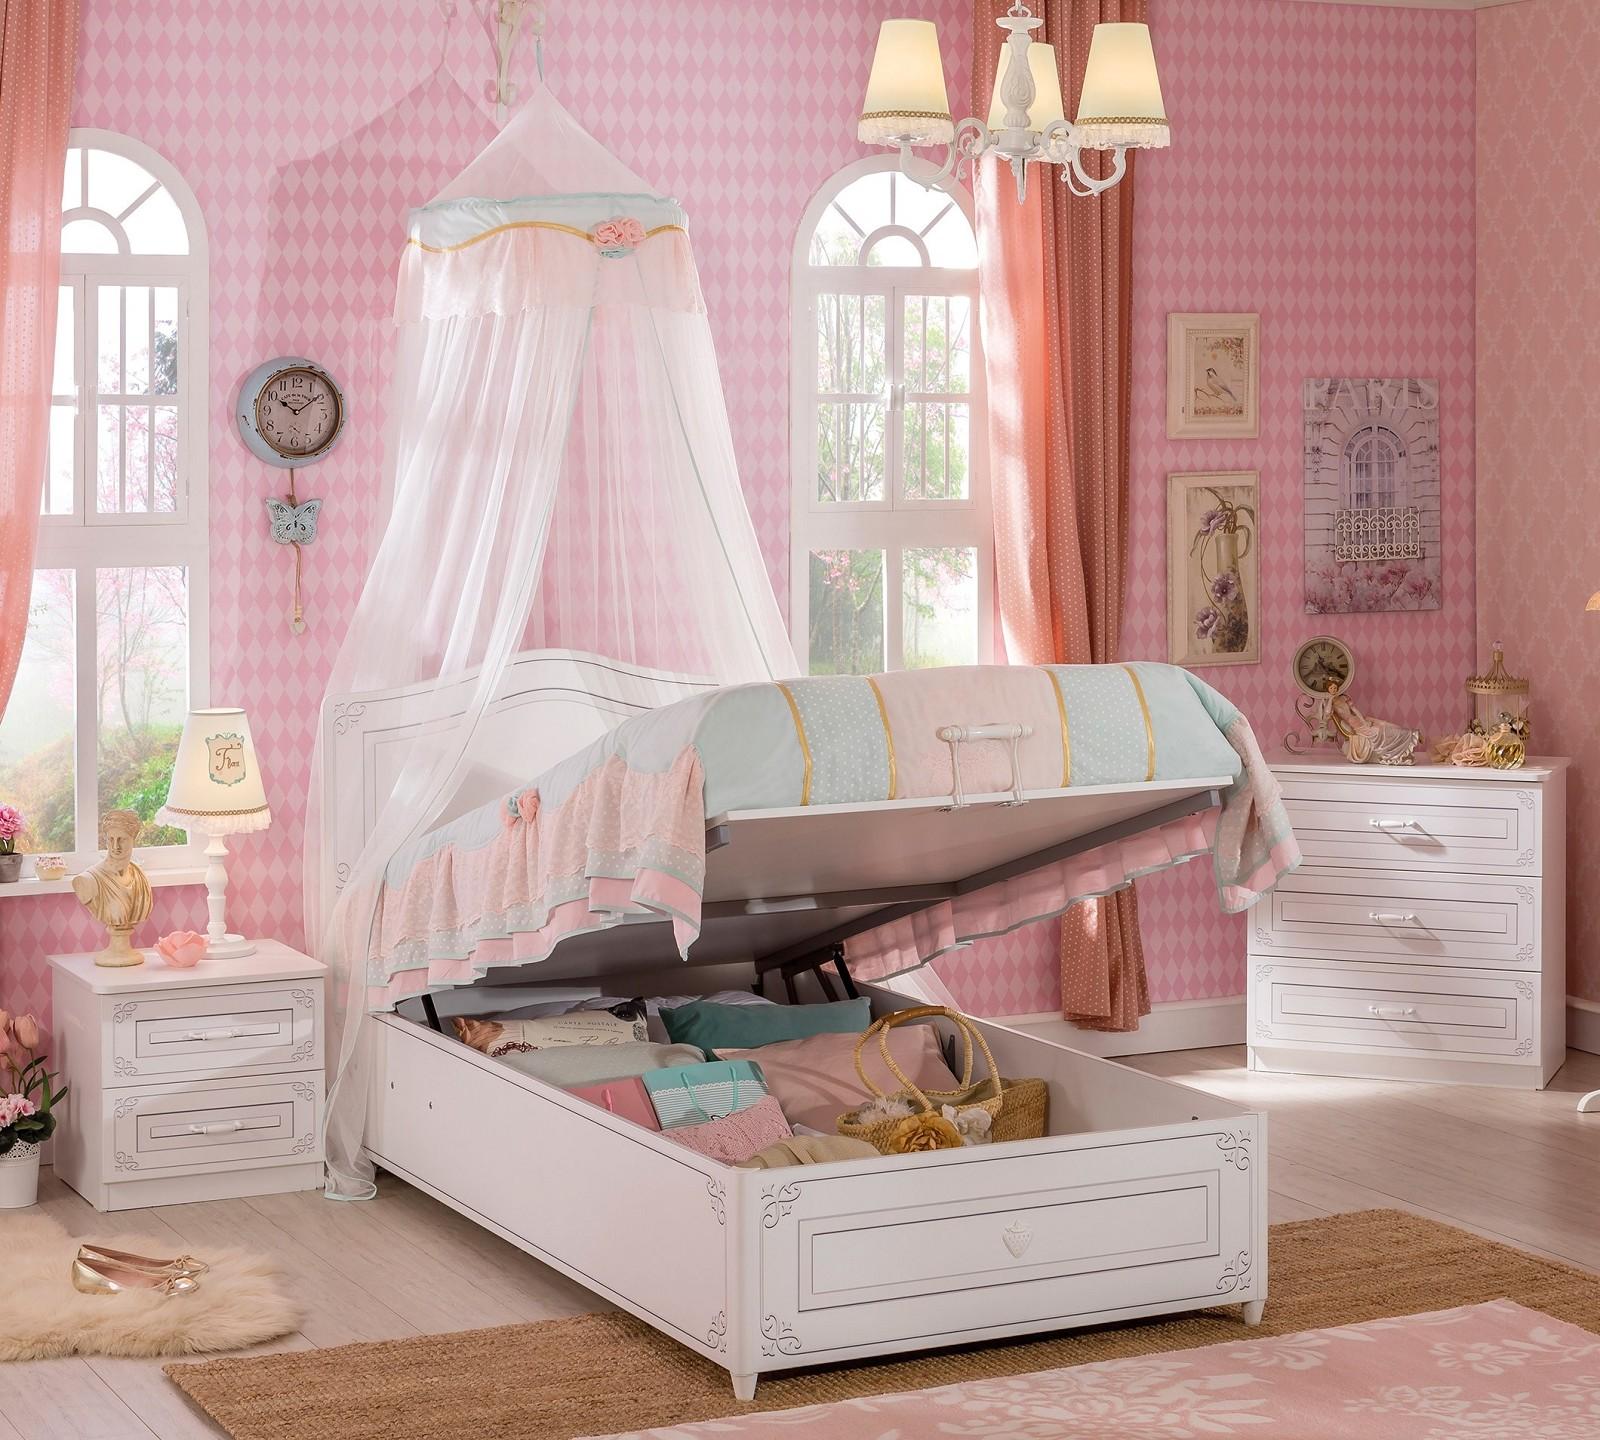 Full Size of Coole Kinderbetten Kinderbett Mit Stauraum 100x200 Selena Kindermbel T Shirt Sprüche Betten T Shirt Wohnzimmer Coole Kinderbetten